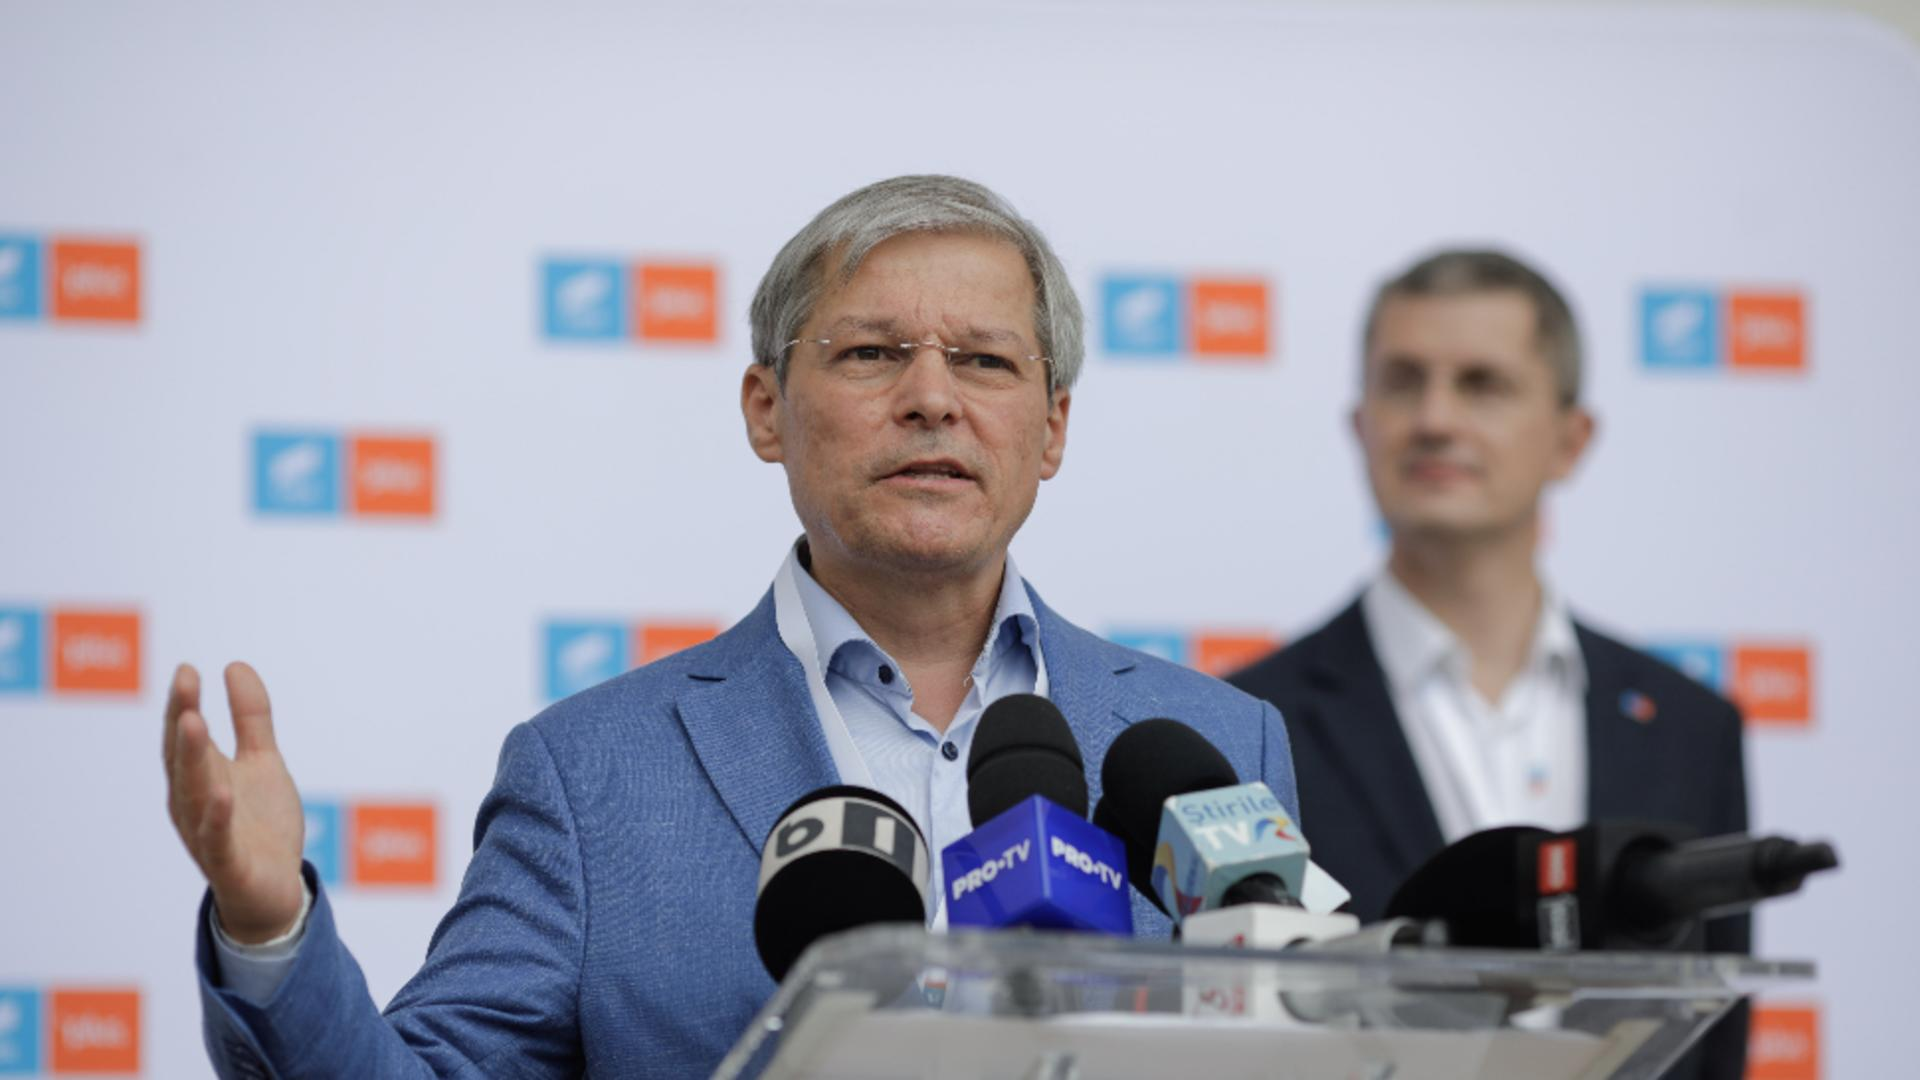 Dacian Cioloș și Dan Barna. Foto: Inquam Photos / George Călin